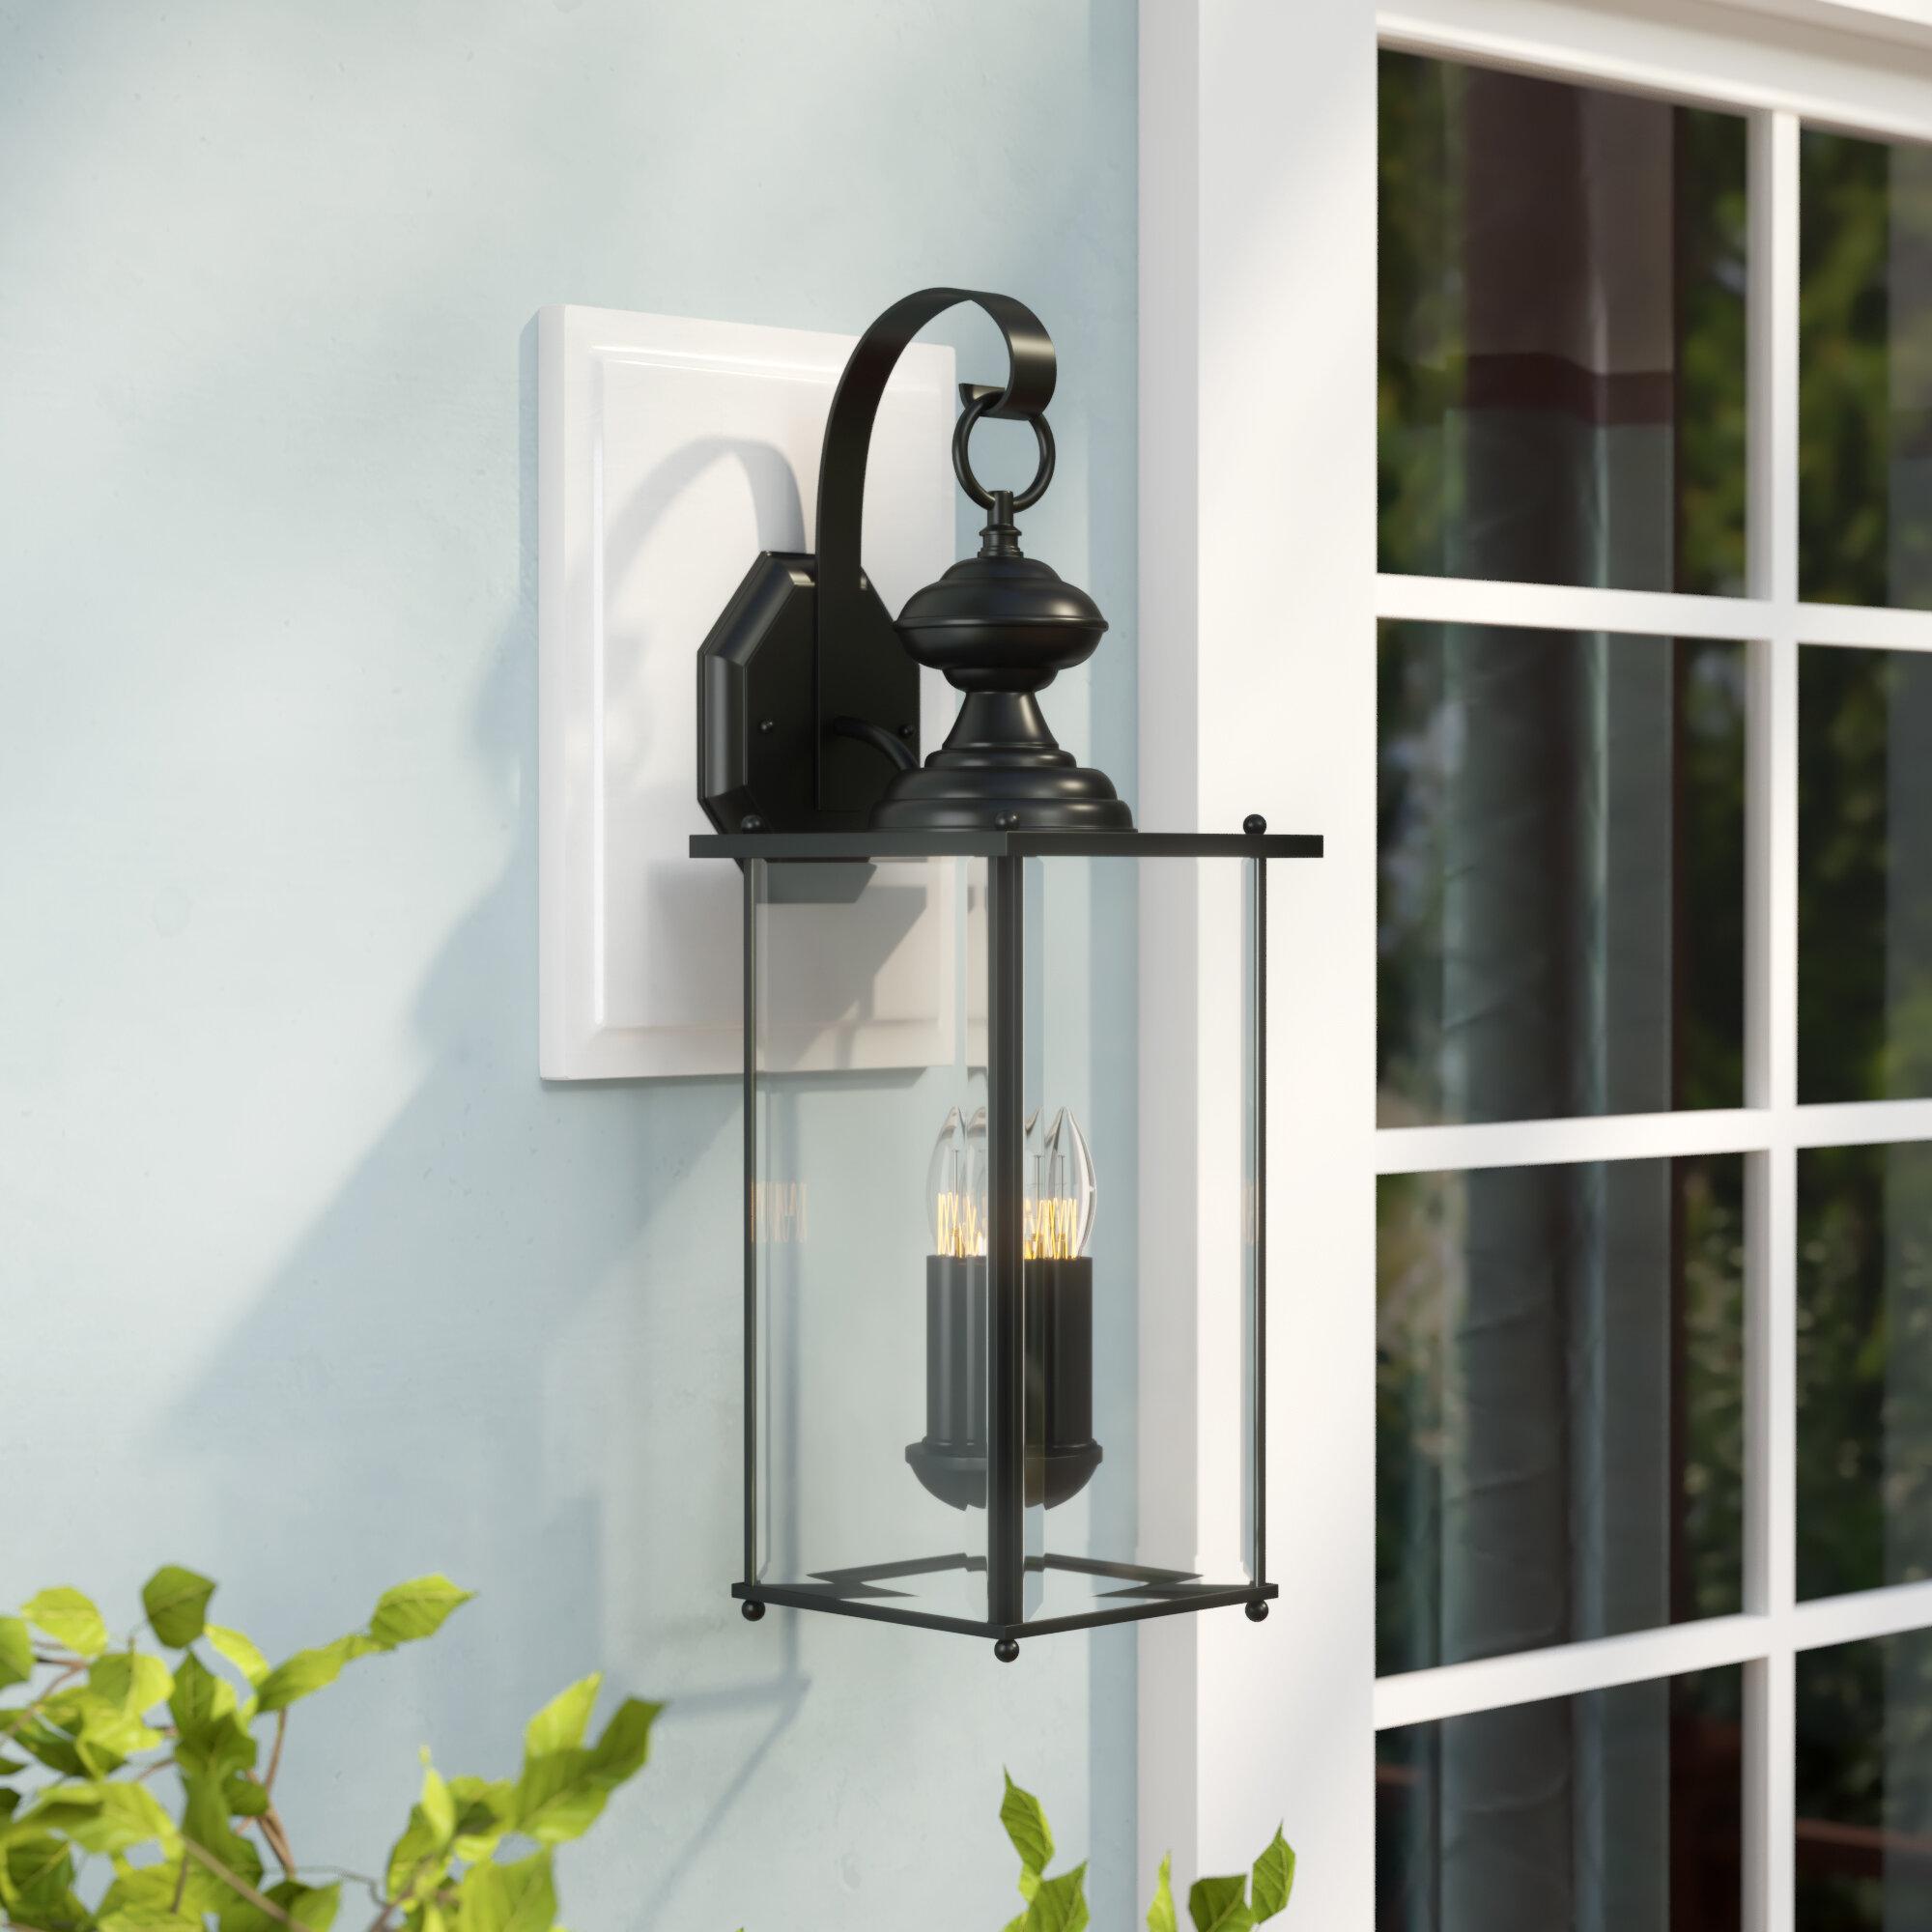 Birch Lane Chicopee 2 Bulb 20 25 H Outdoor Wall Lantern Reviews Wayfair